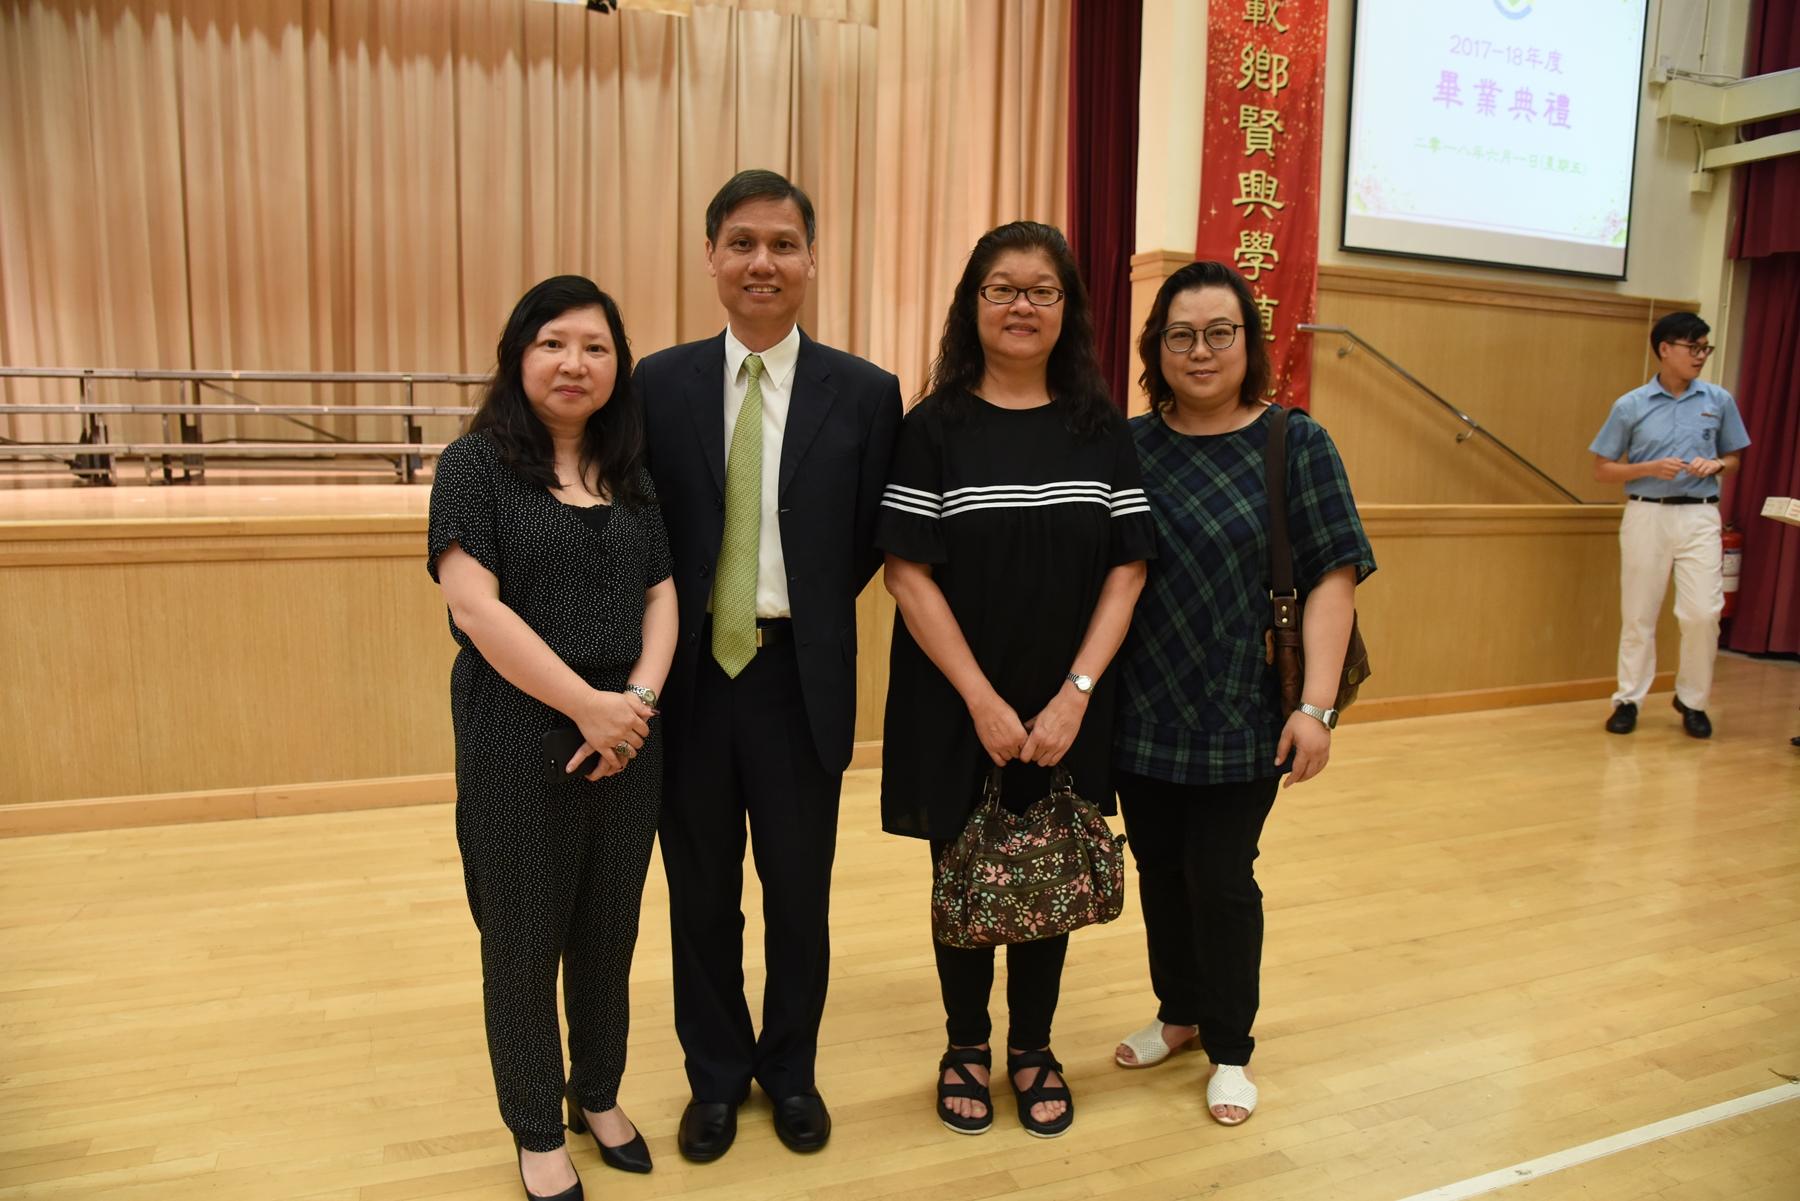 http://npc.edu.hk/sites/default/files/dsc_1660_2.jpg